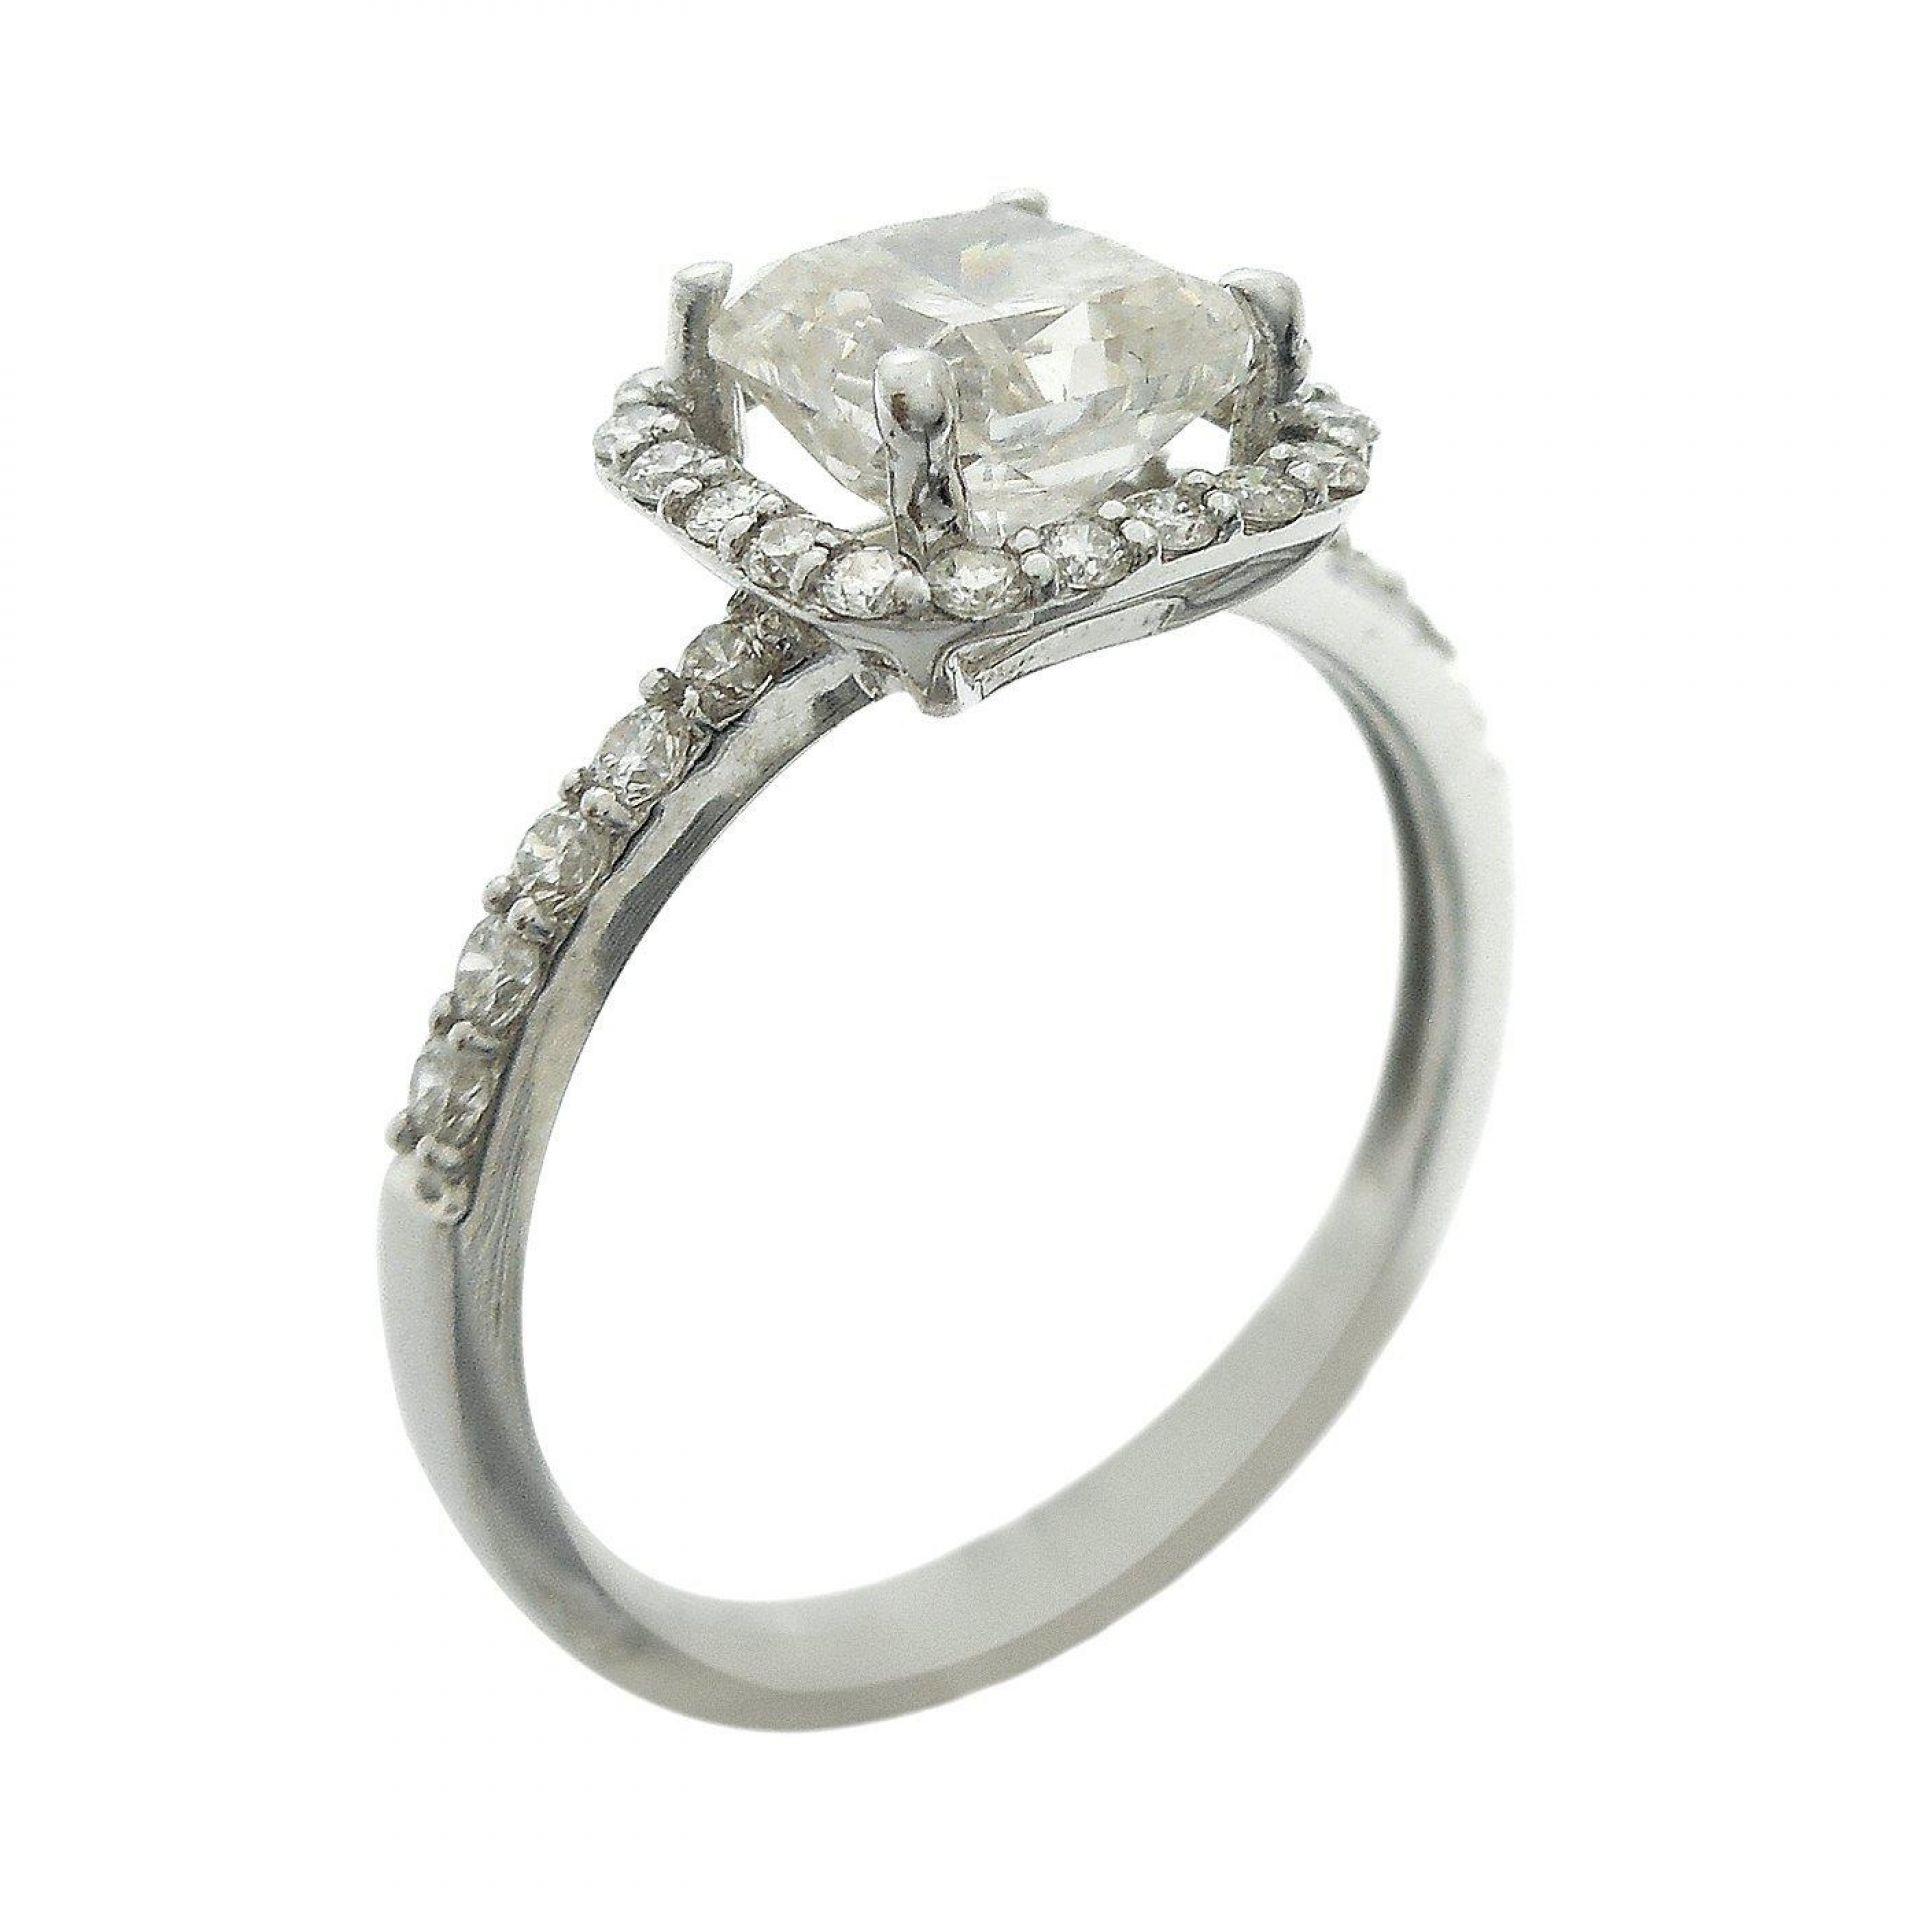 1.51ct CENTER Radiant Cut Diamond 18KT White Gold Ring (1.90ctw Diamonds)